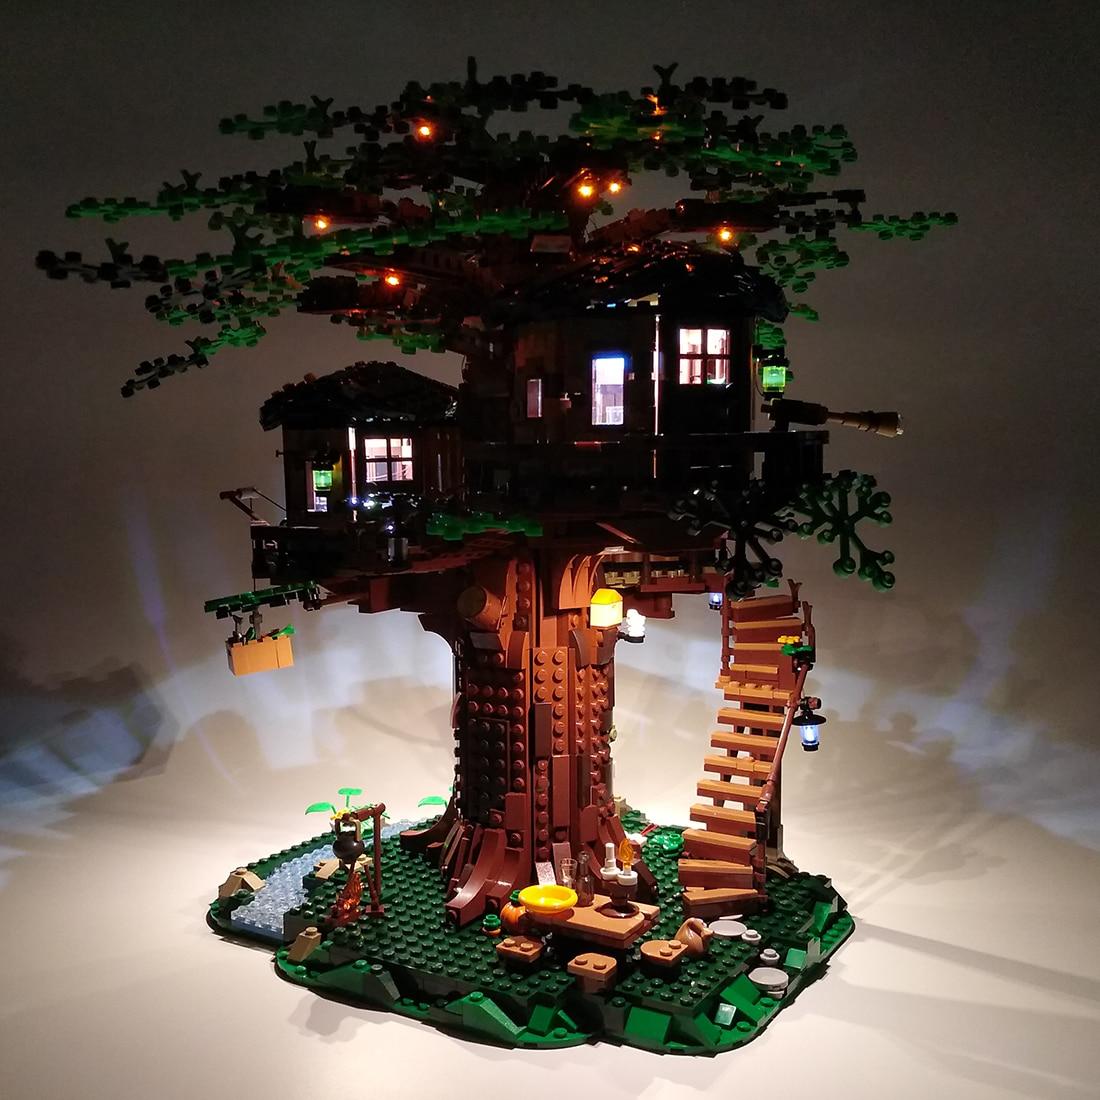 construção acessório kit para casa na árvore